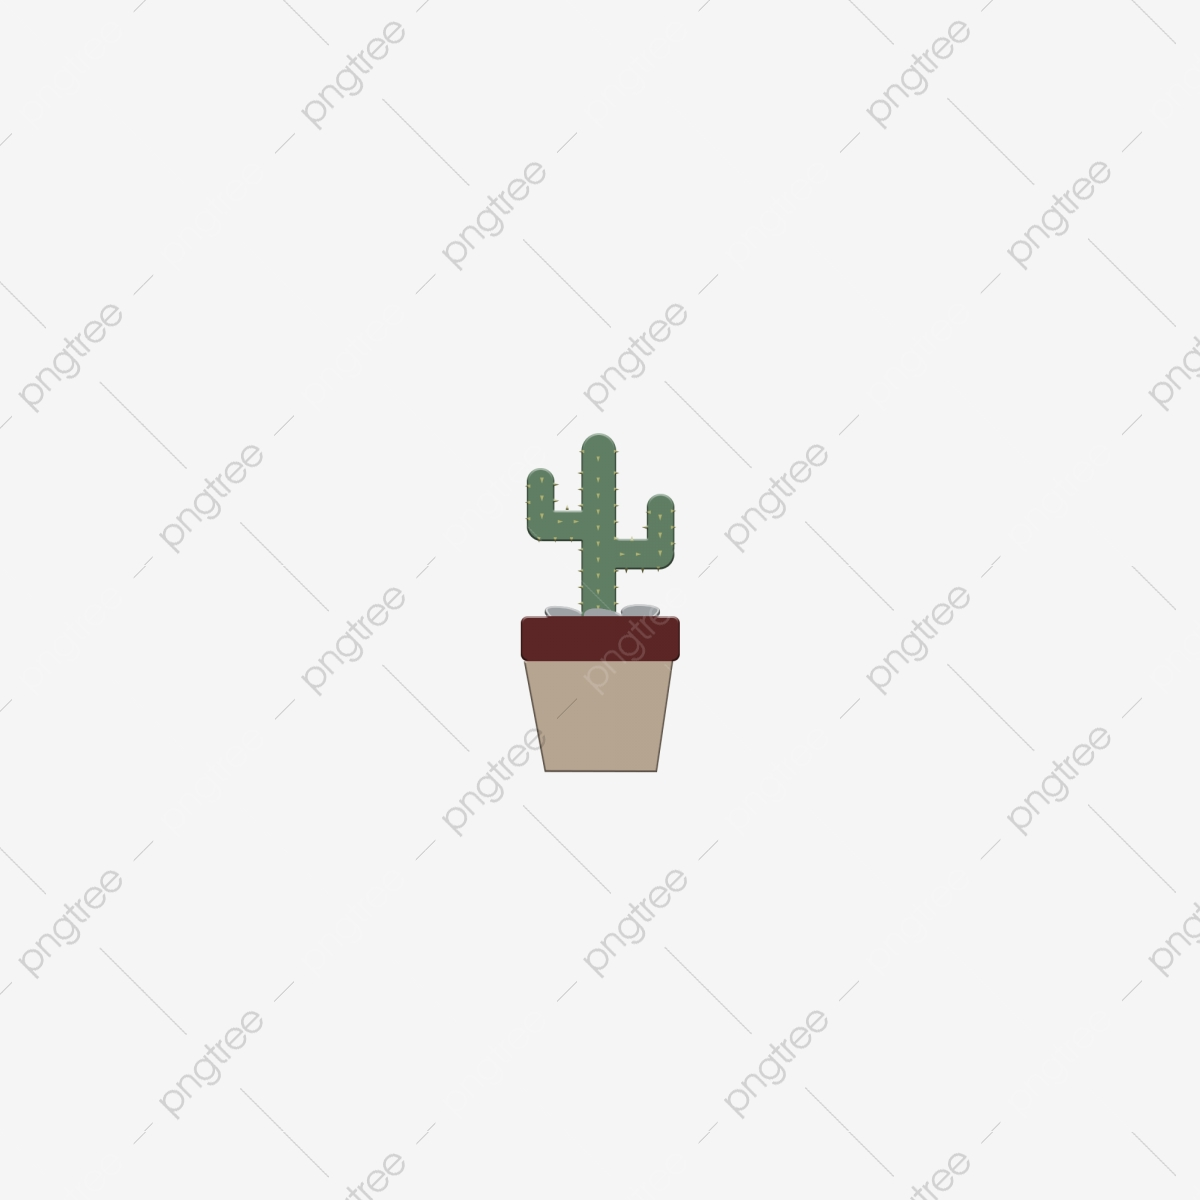 Cactus minimalist. Furniture element green plant